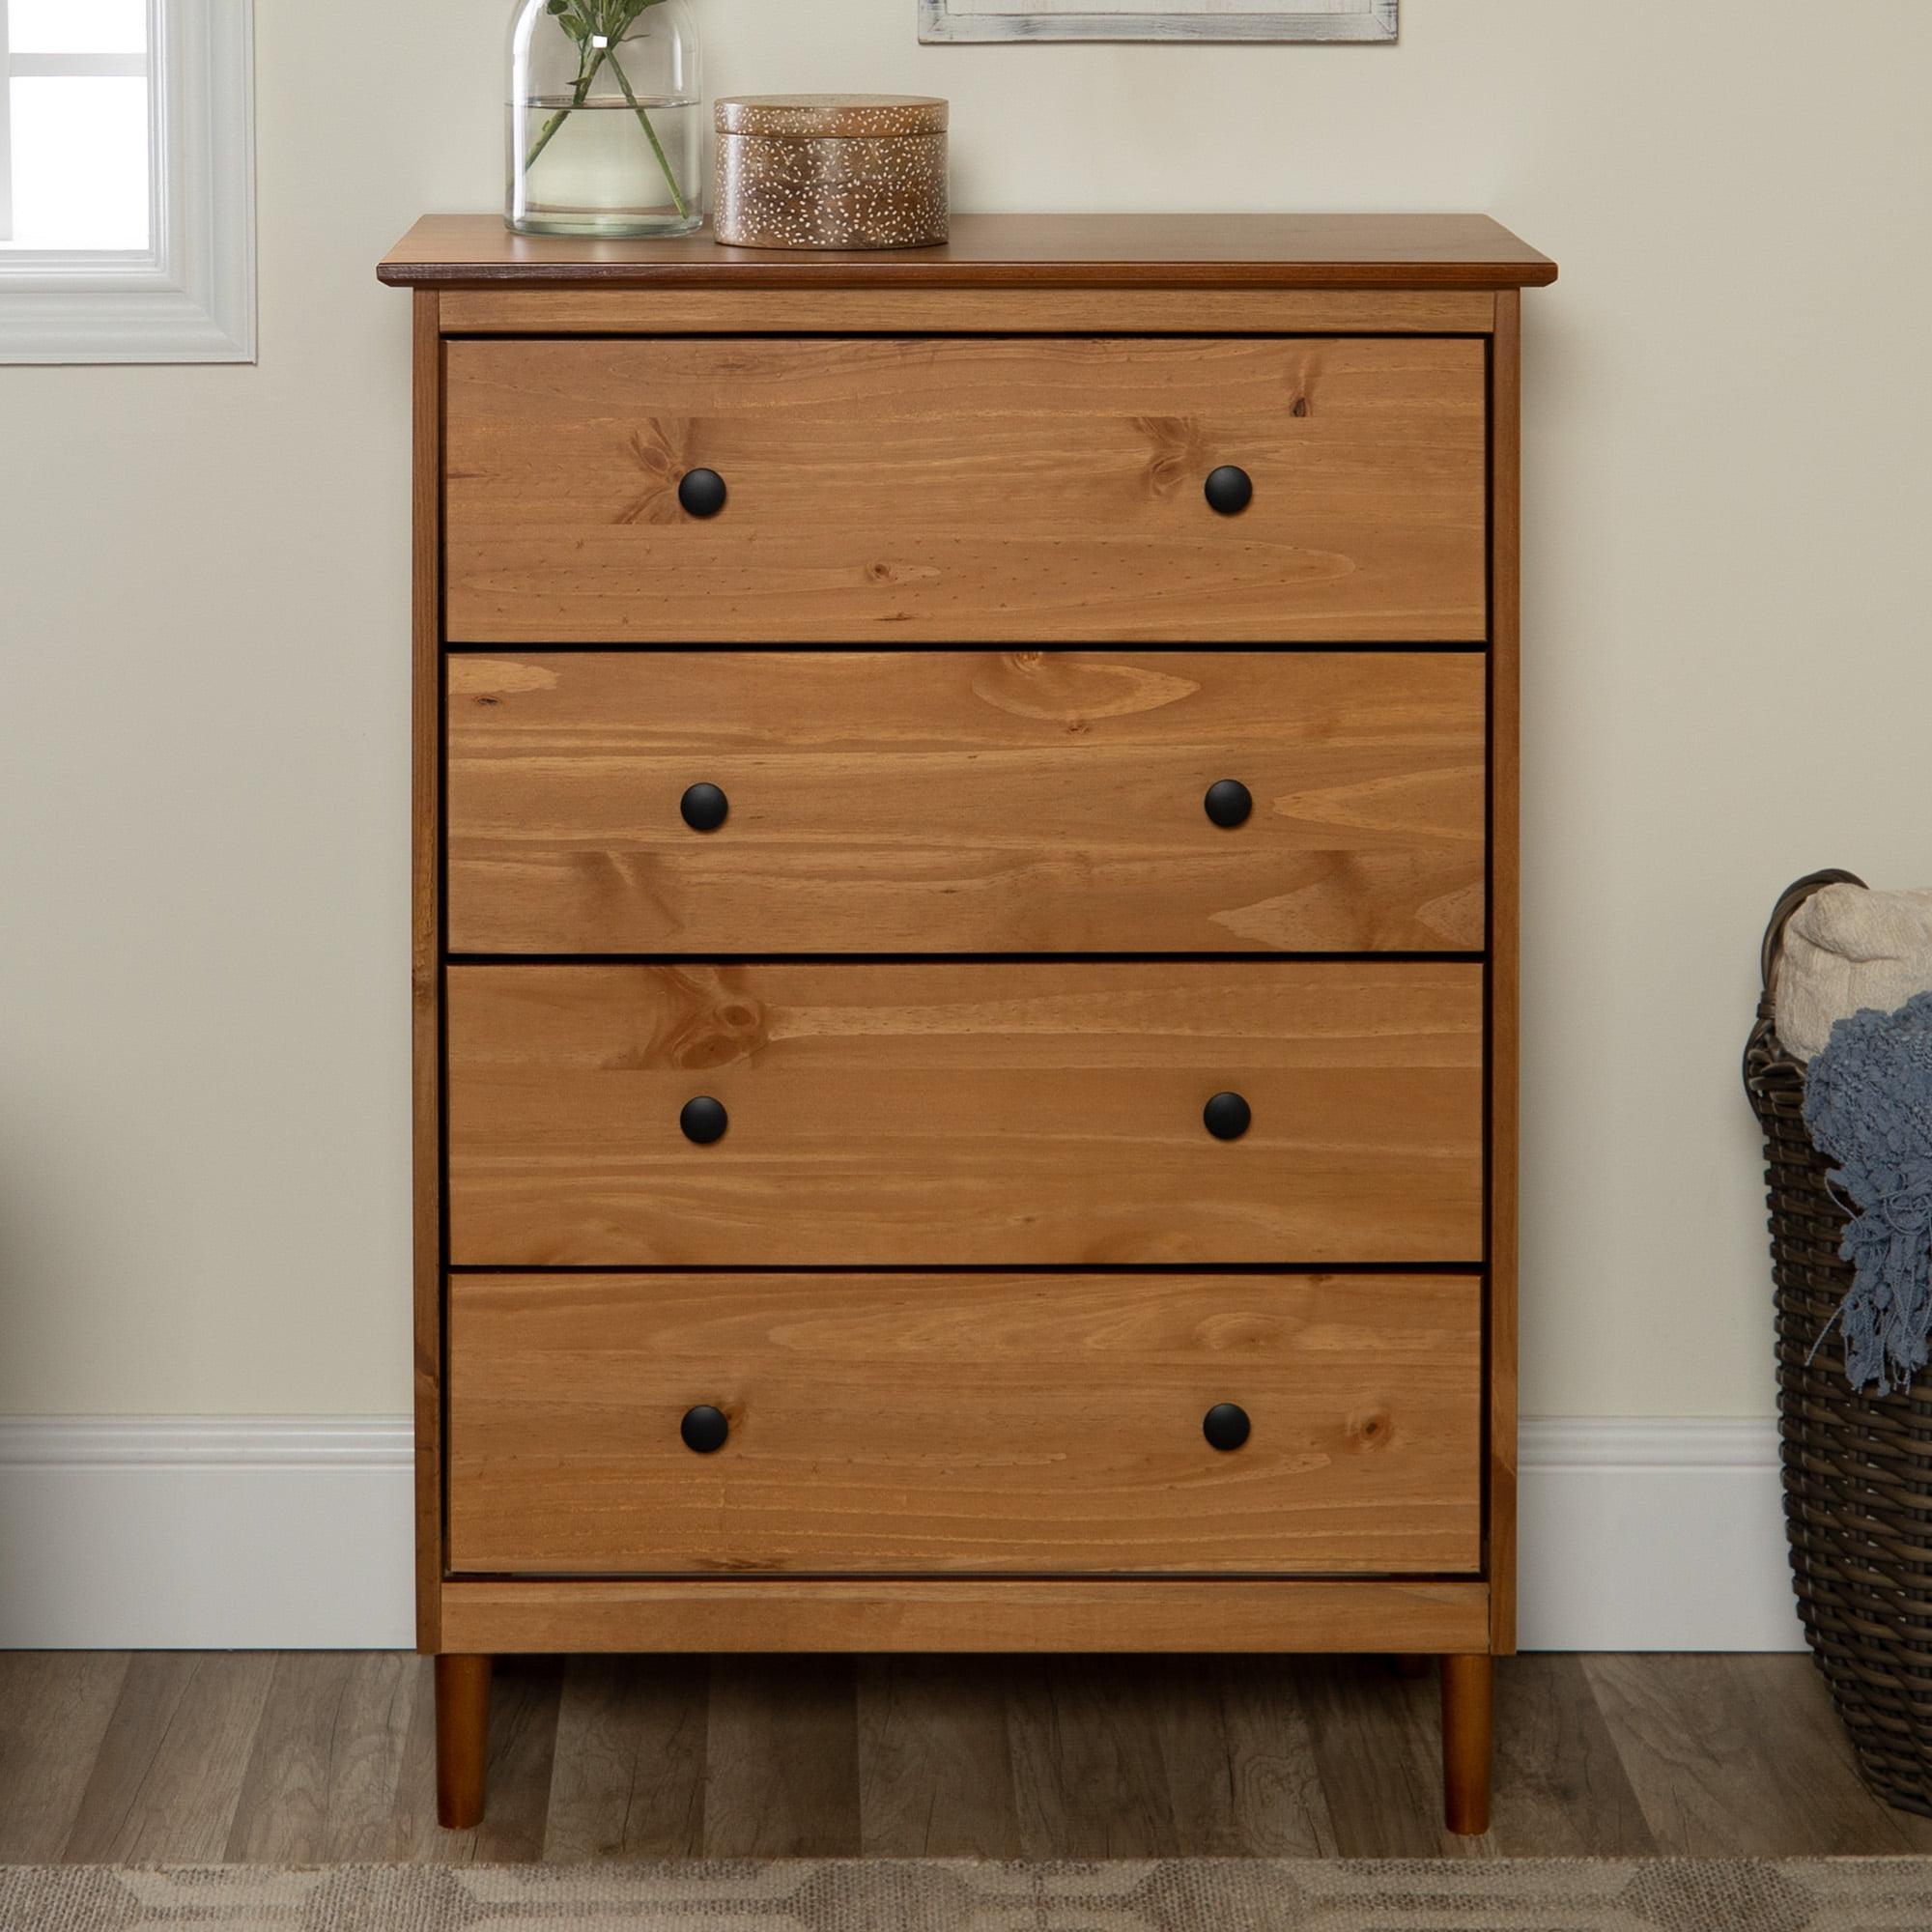 Manor Park Mid-Century Modern 4-Drawer Solid Wood Dresser - Caramel